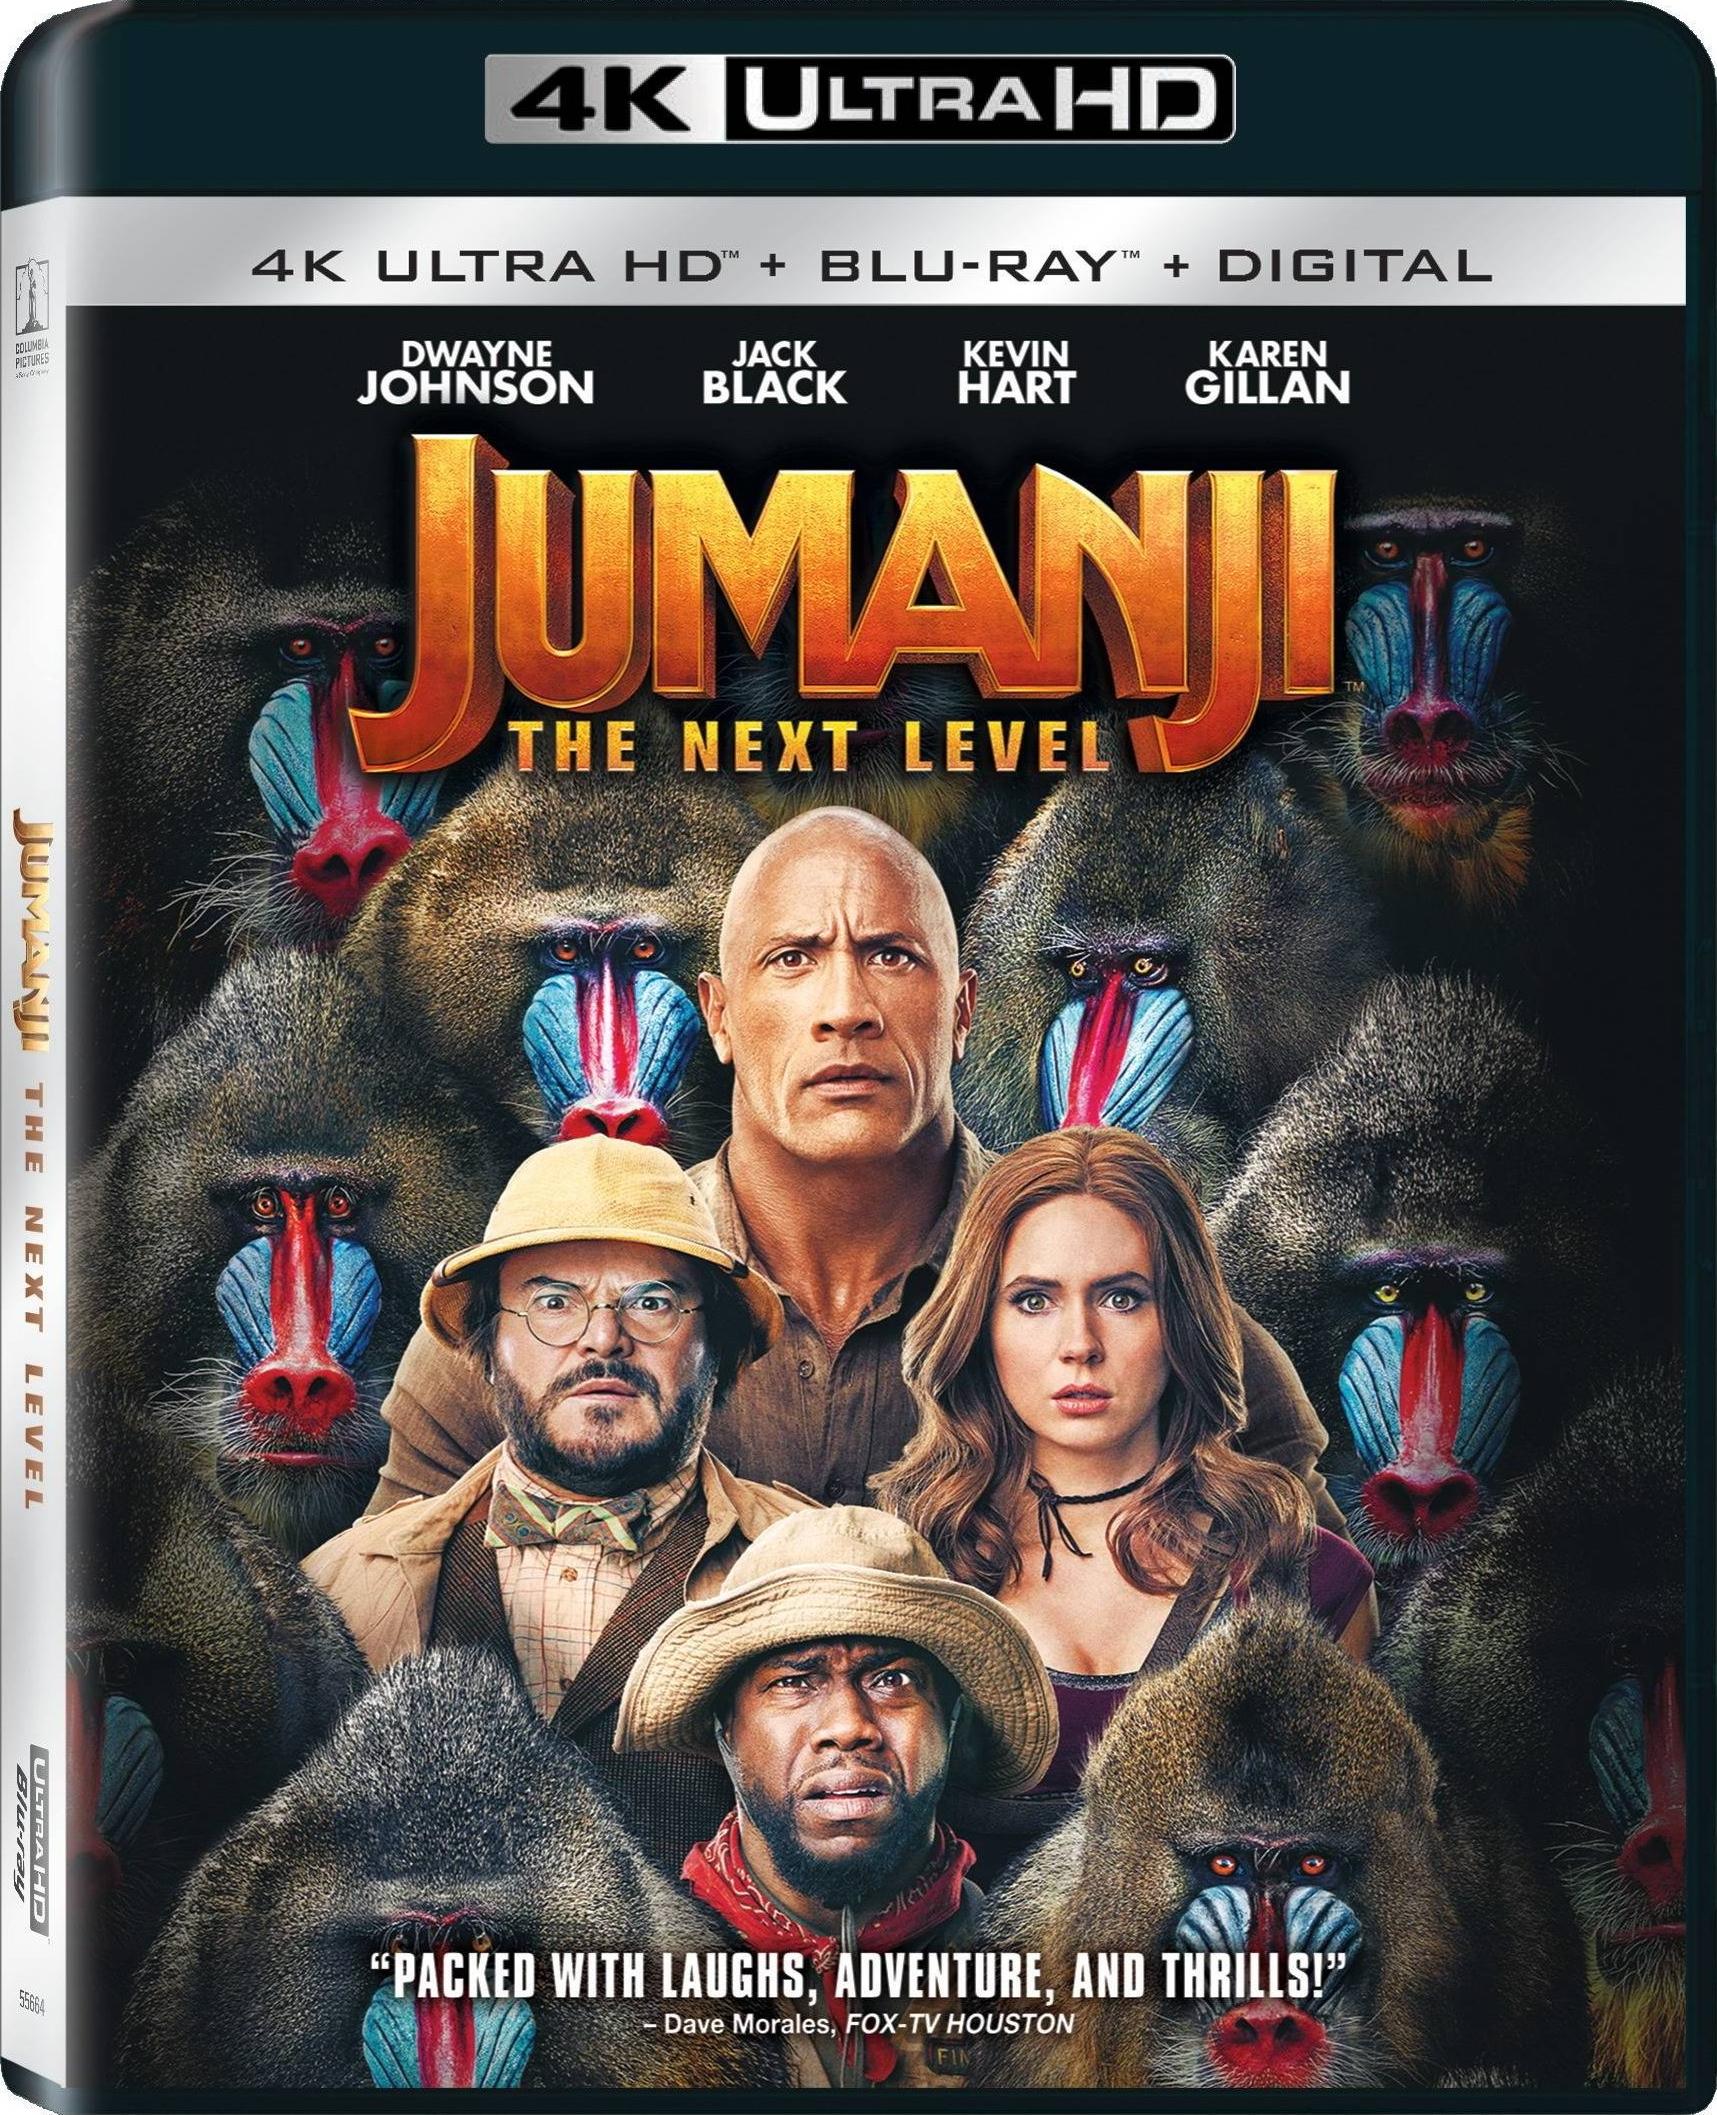 Jumanji: The Next Level 2019 BluRay 1080p DTS:X 7.1 AVC HYBRID REMUX-FraMeSToR